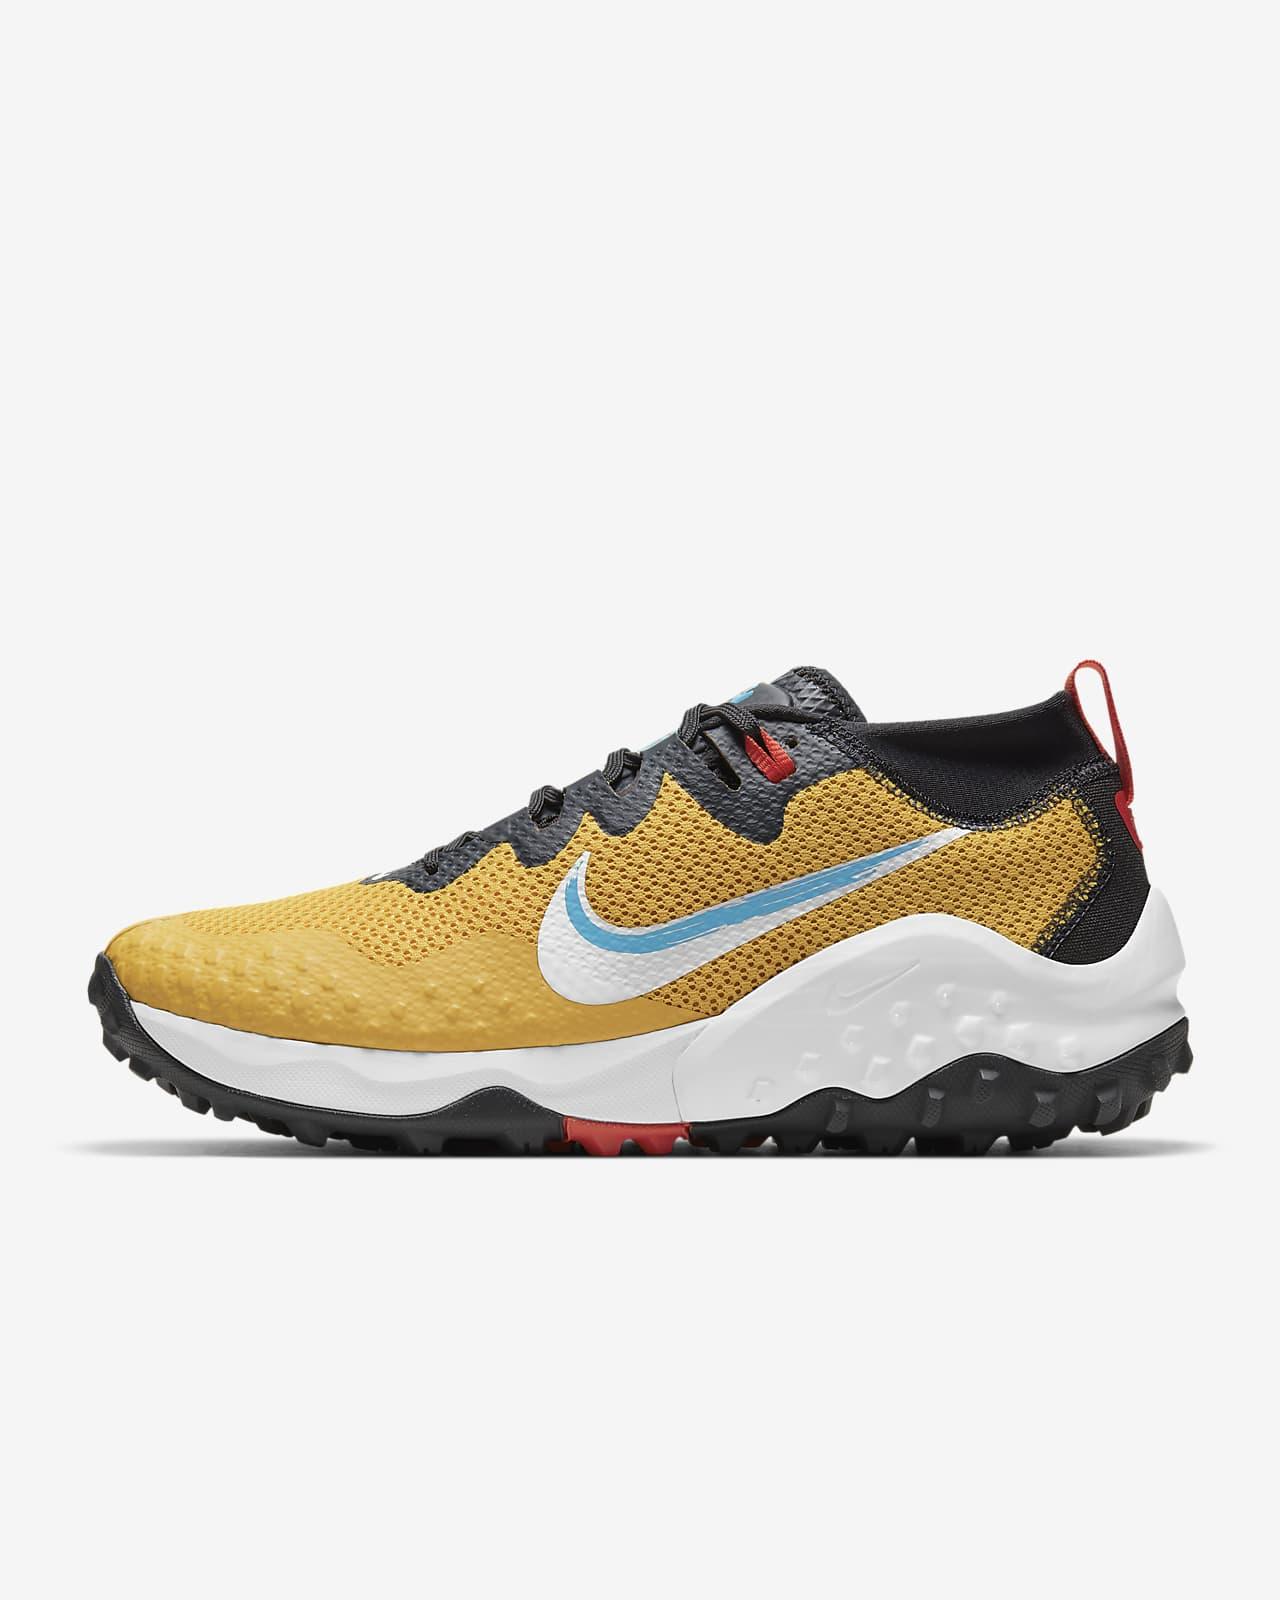 Nike Wildhorse 7 Men's Trail Running Shoes